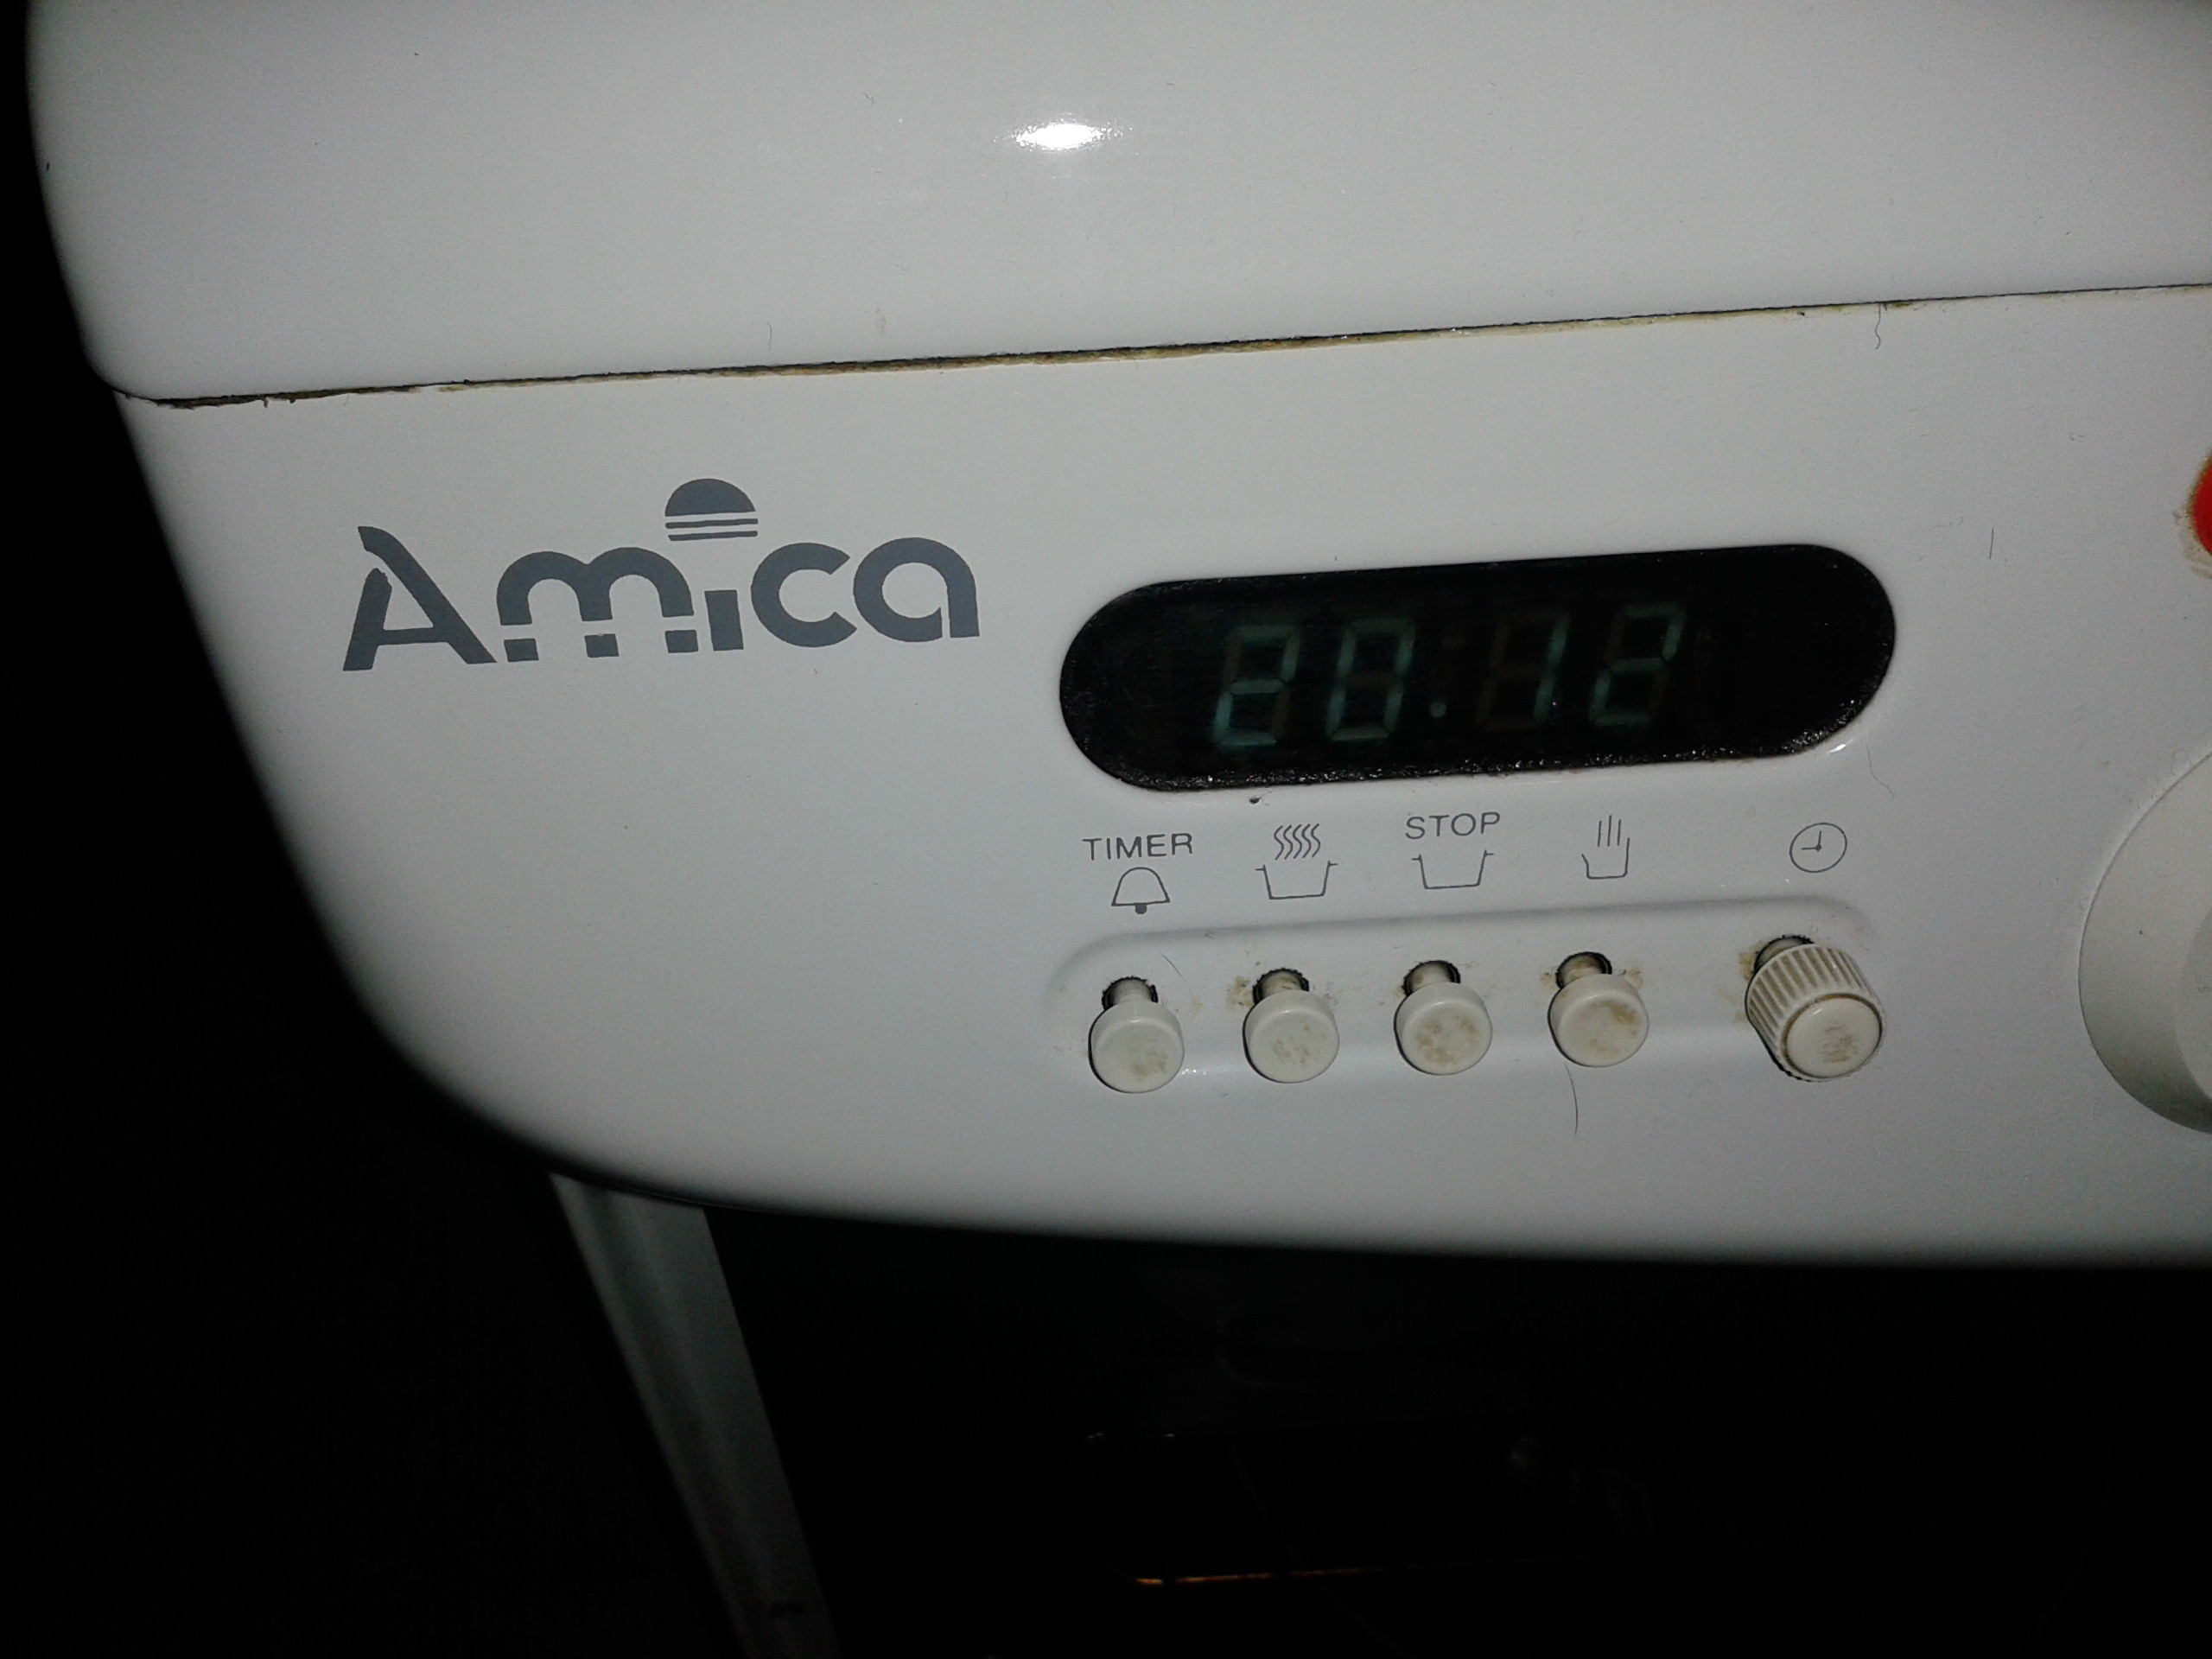 Kuchenka Amica  zapytanie o model  elektroda pl -> Kuchnie Amica Modele